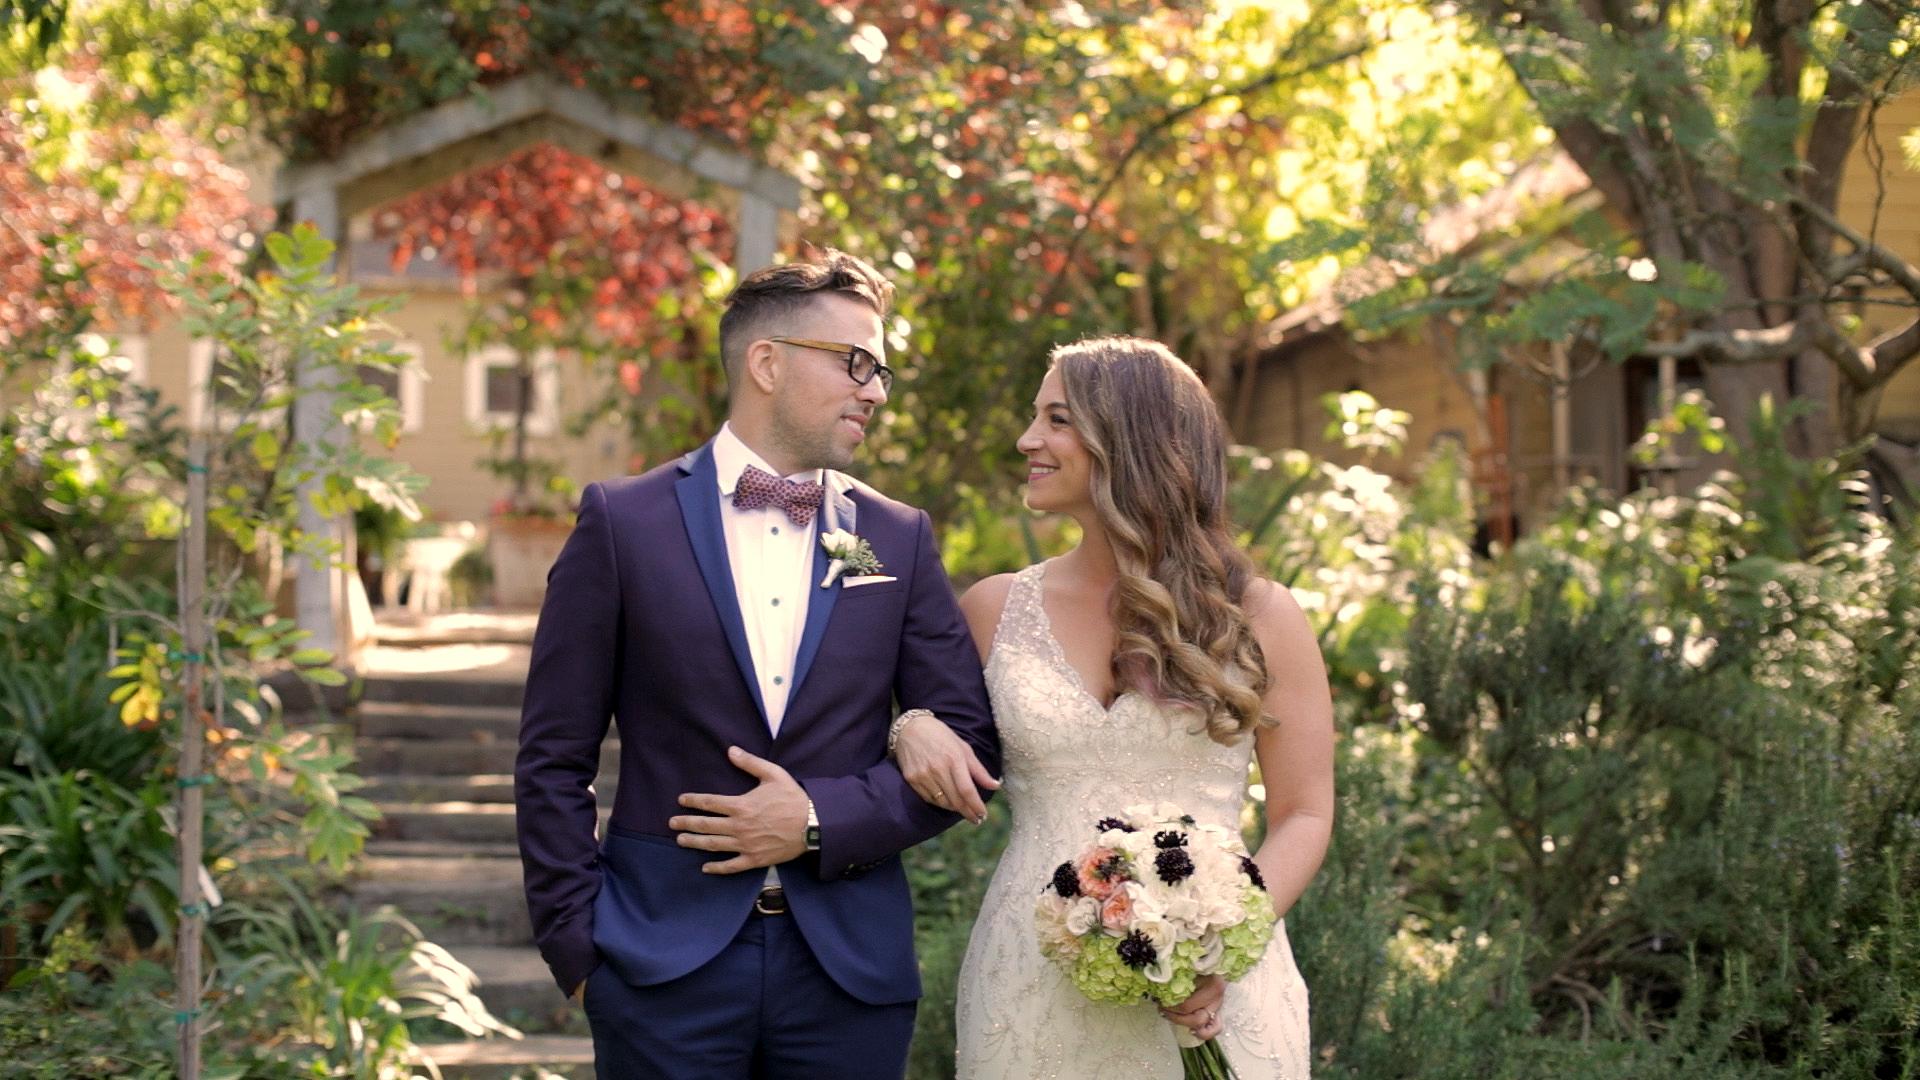 laurynandrew-bridegroom.jpg